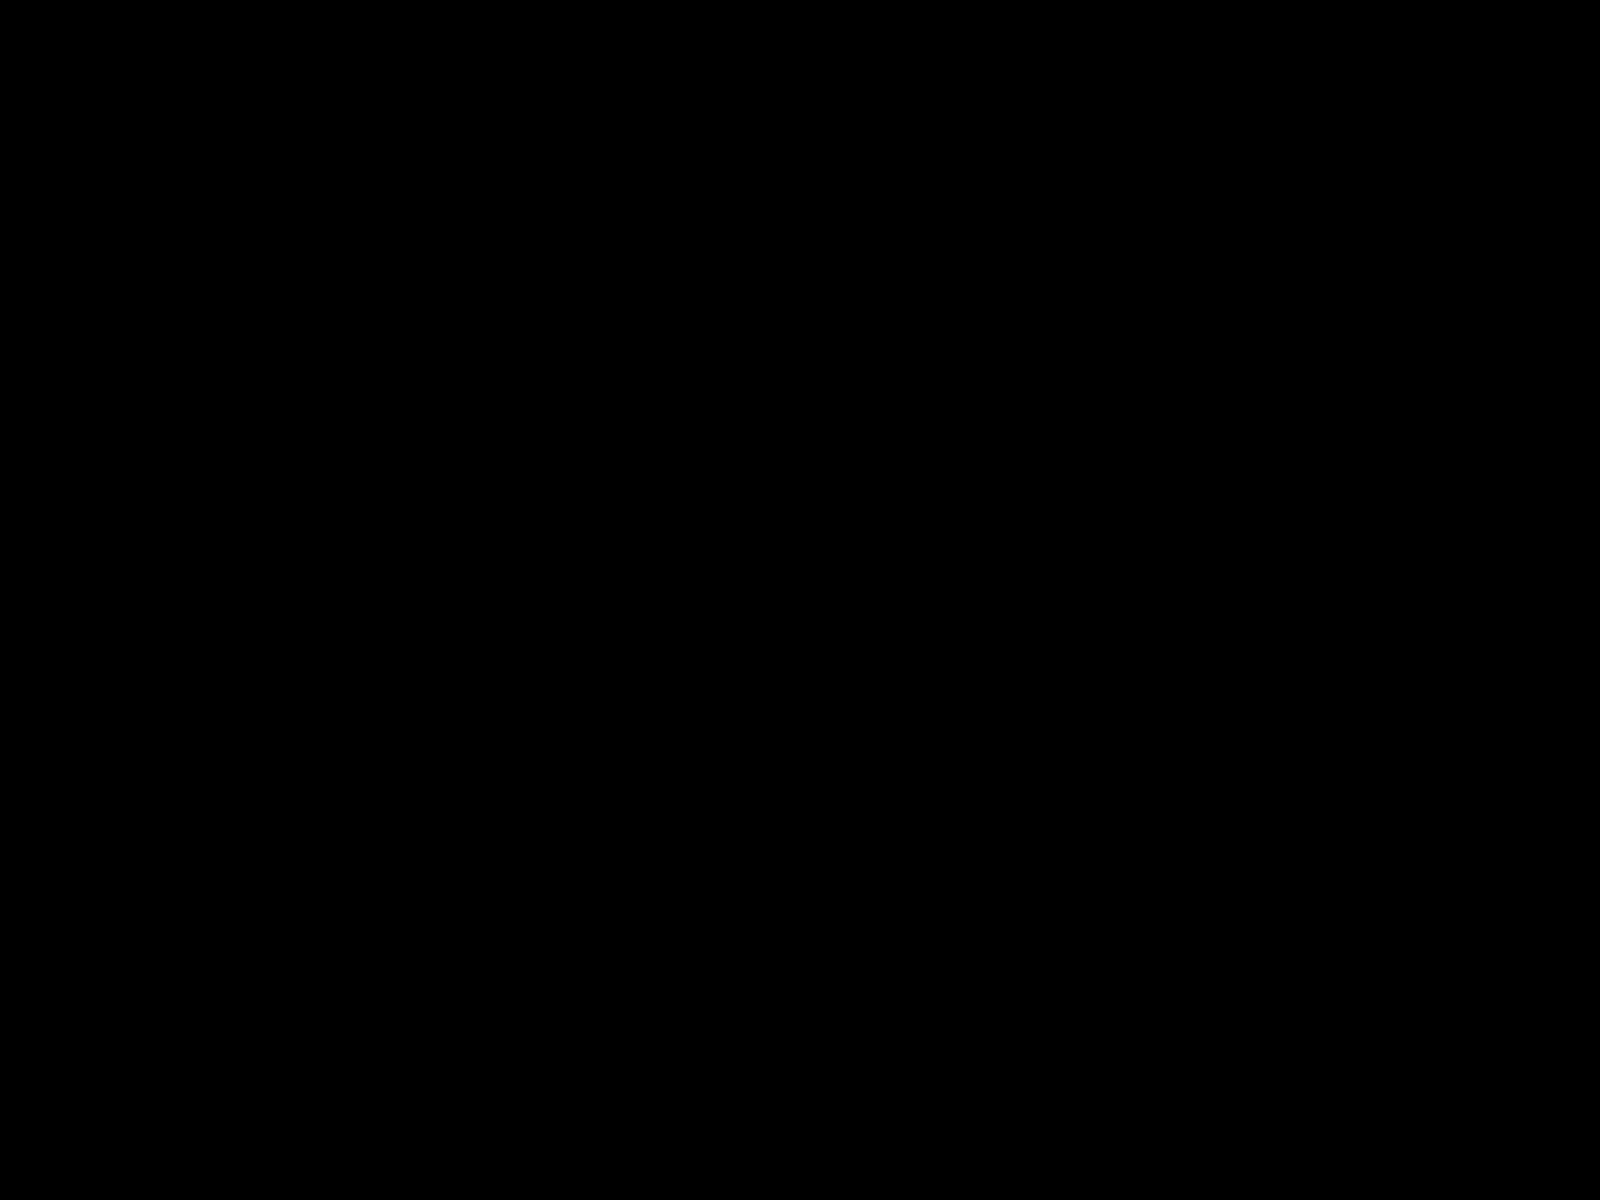 AE 05